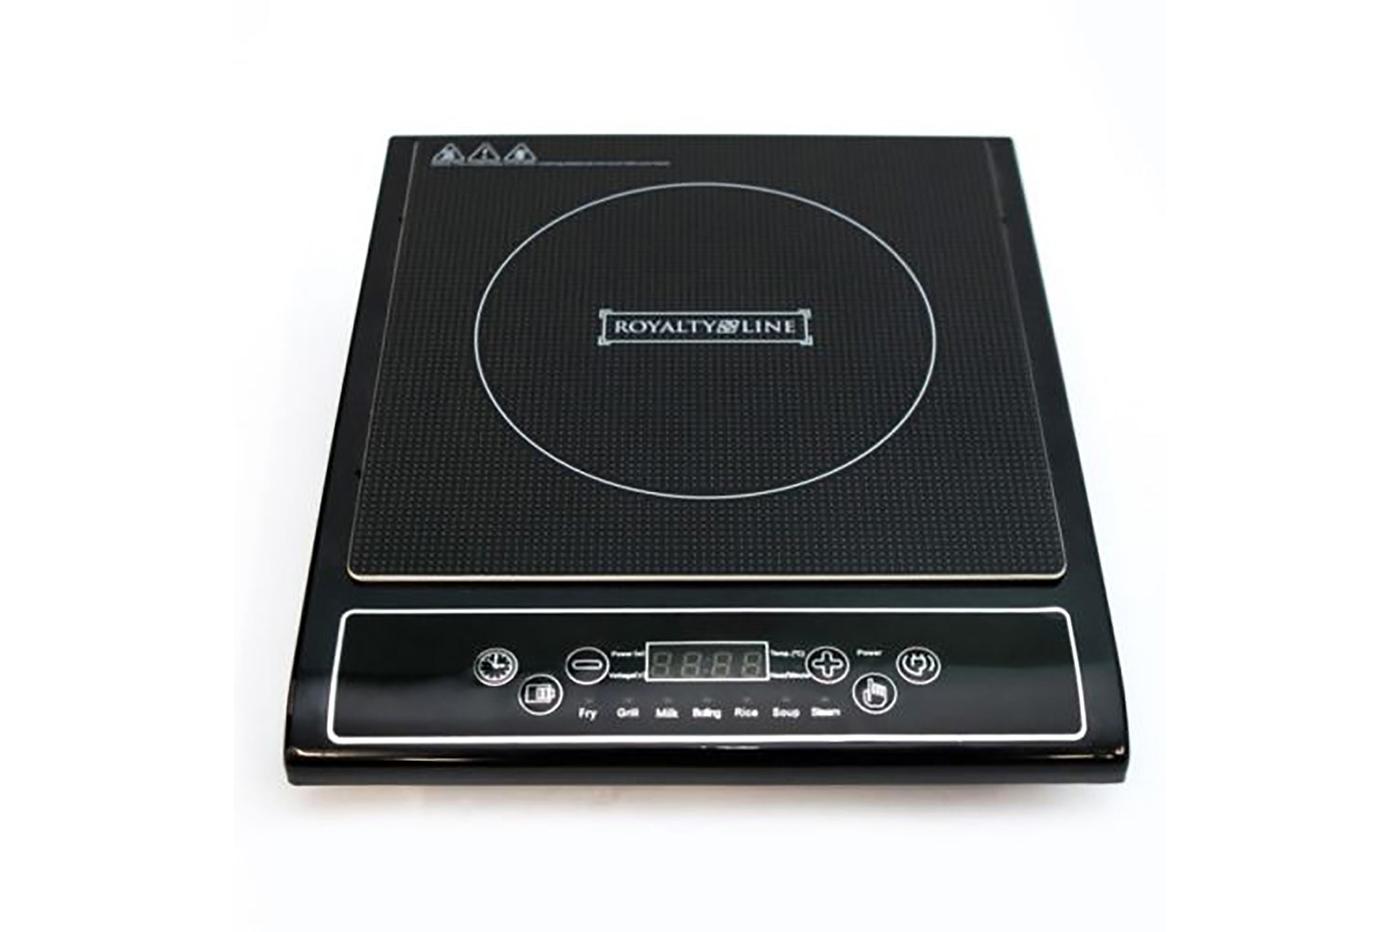 bes-20868 - casa - beselettronica - piastra induzione fornello ... - Induzione Cucina